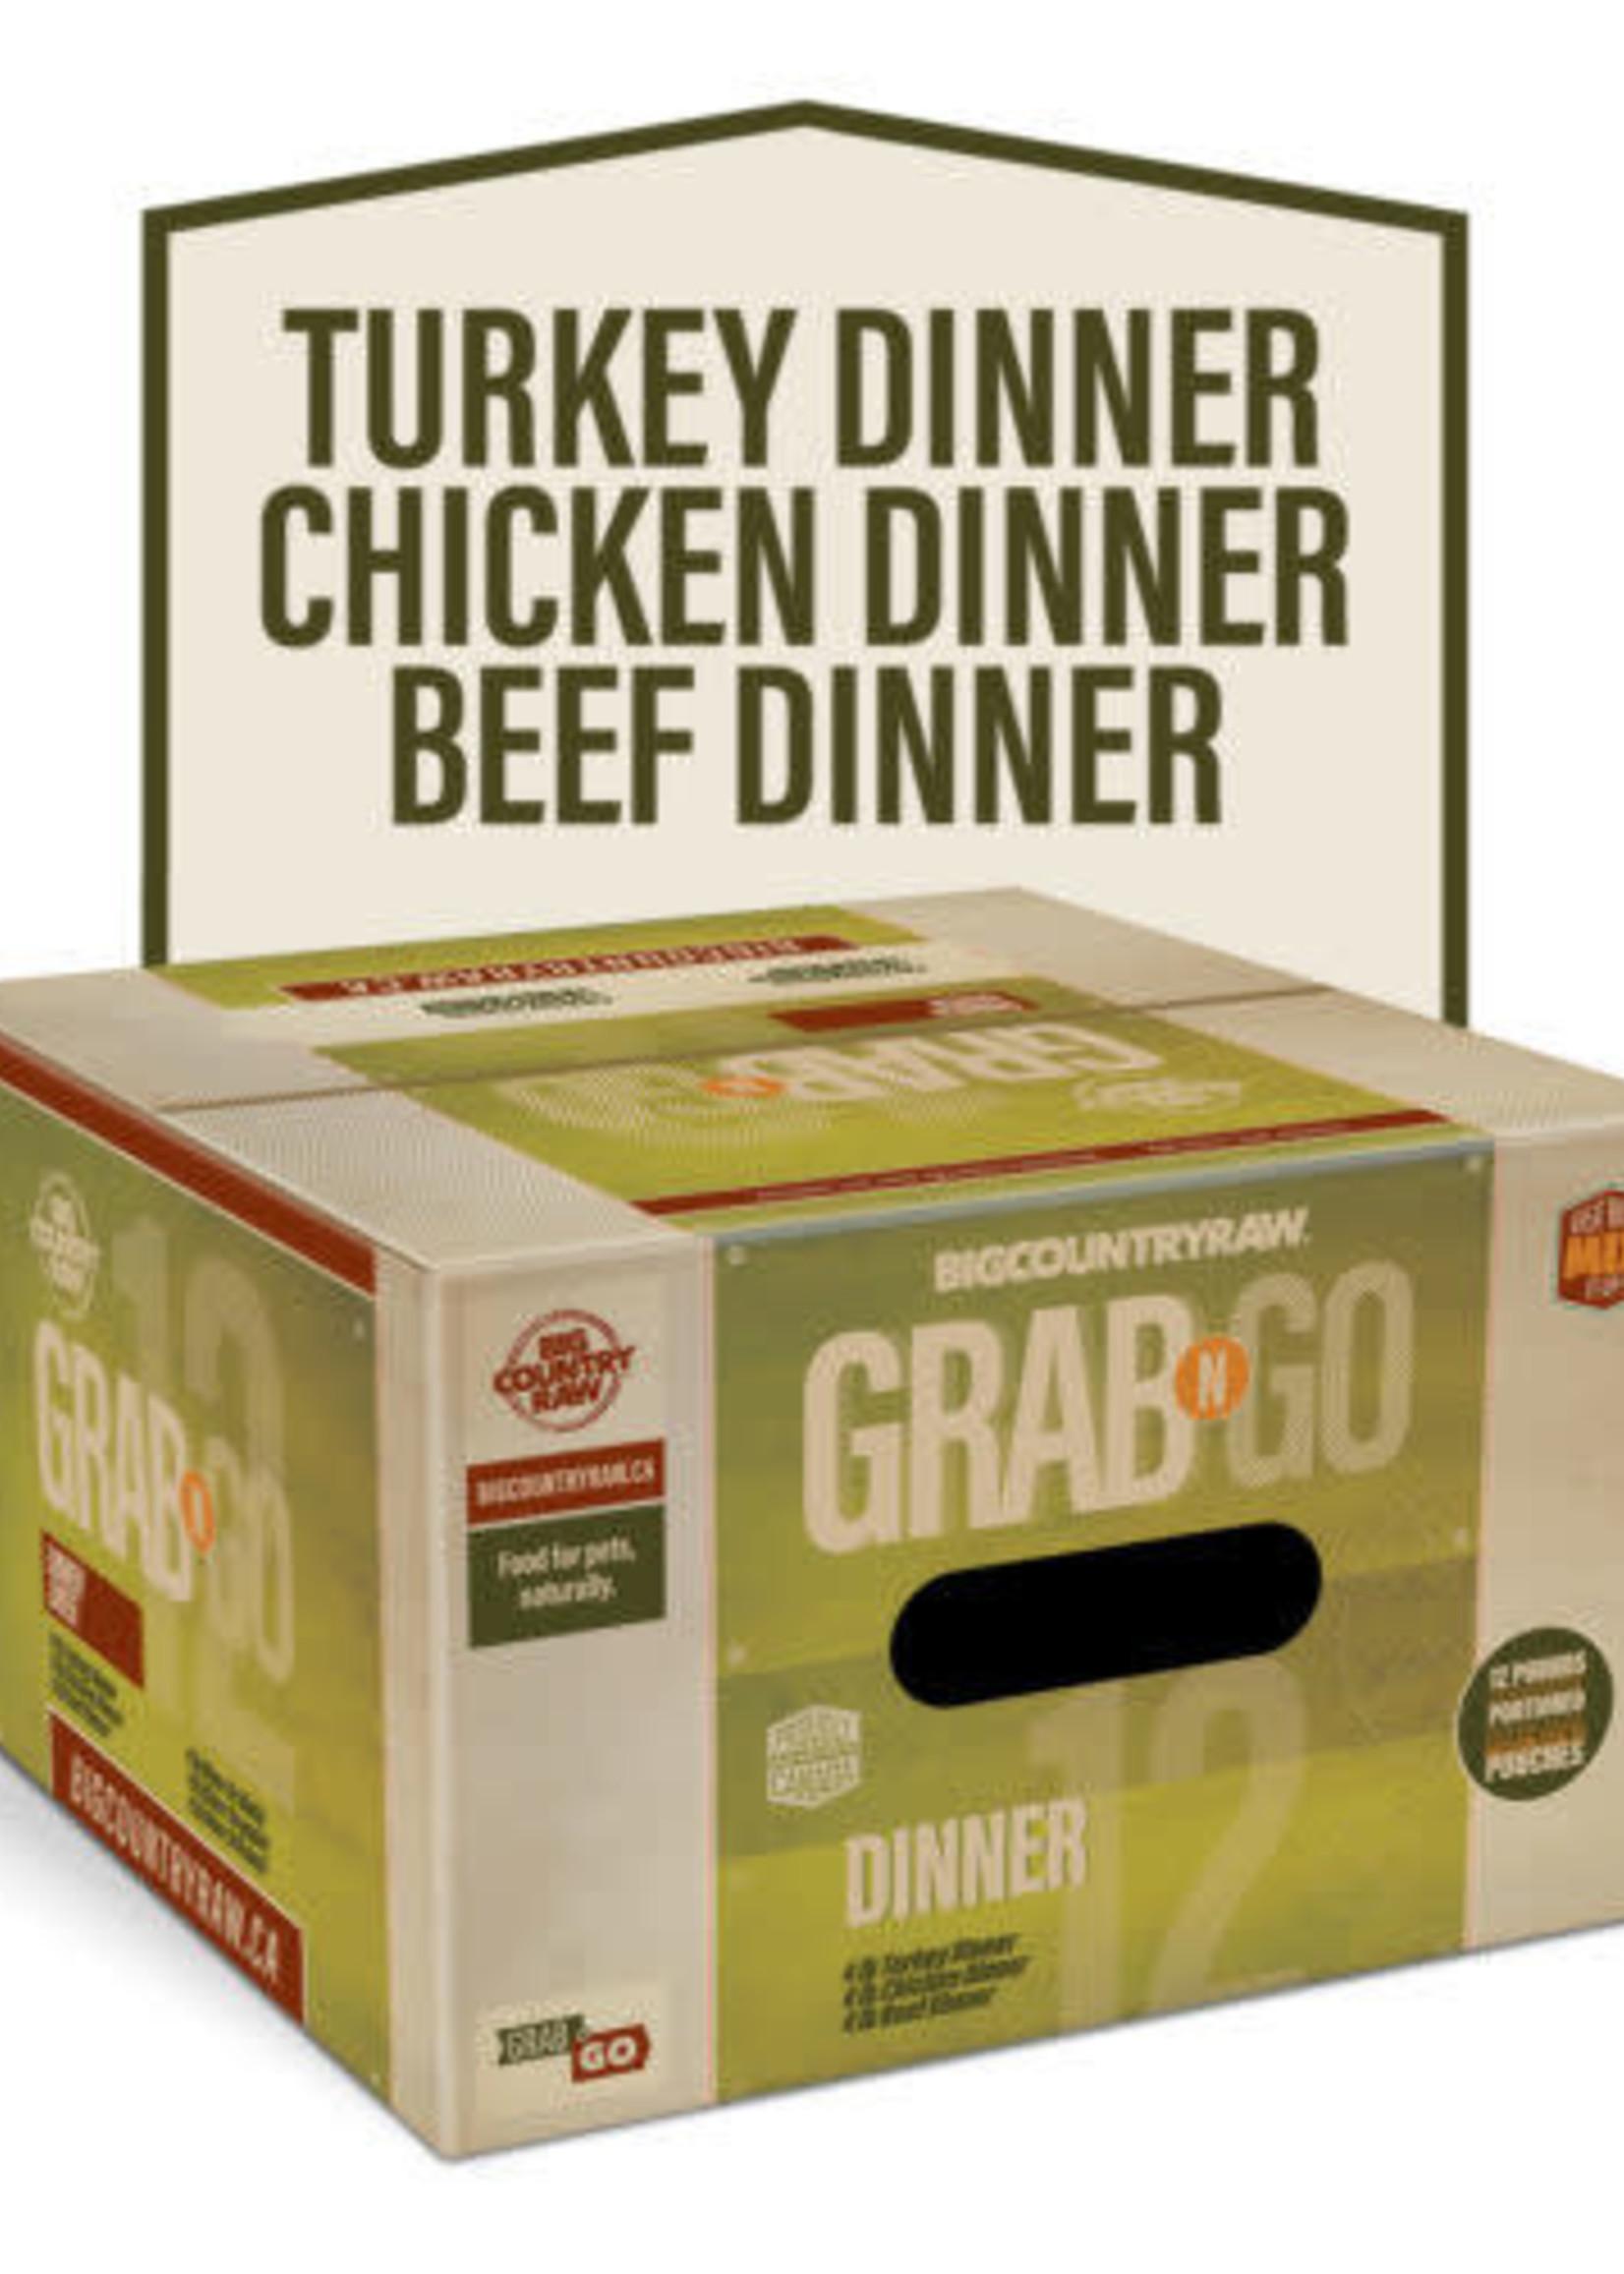 Big Country Raw Big Country Raw Grab N Go Dinner 12lbs